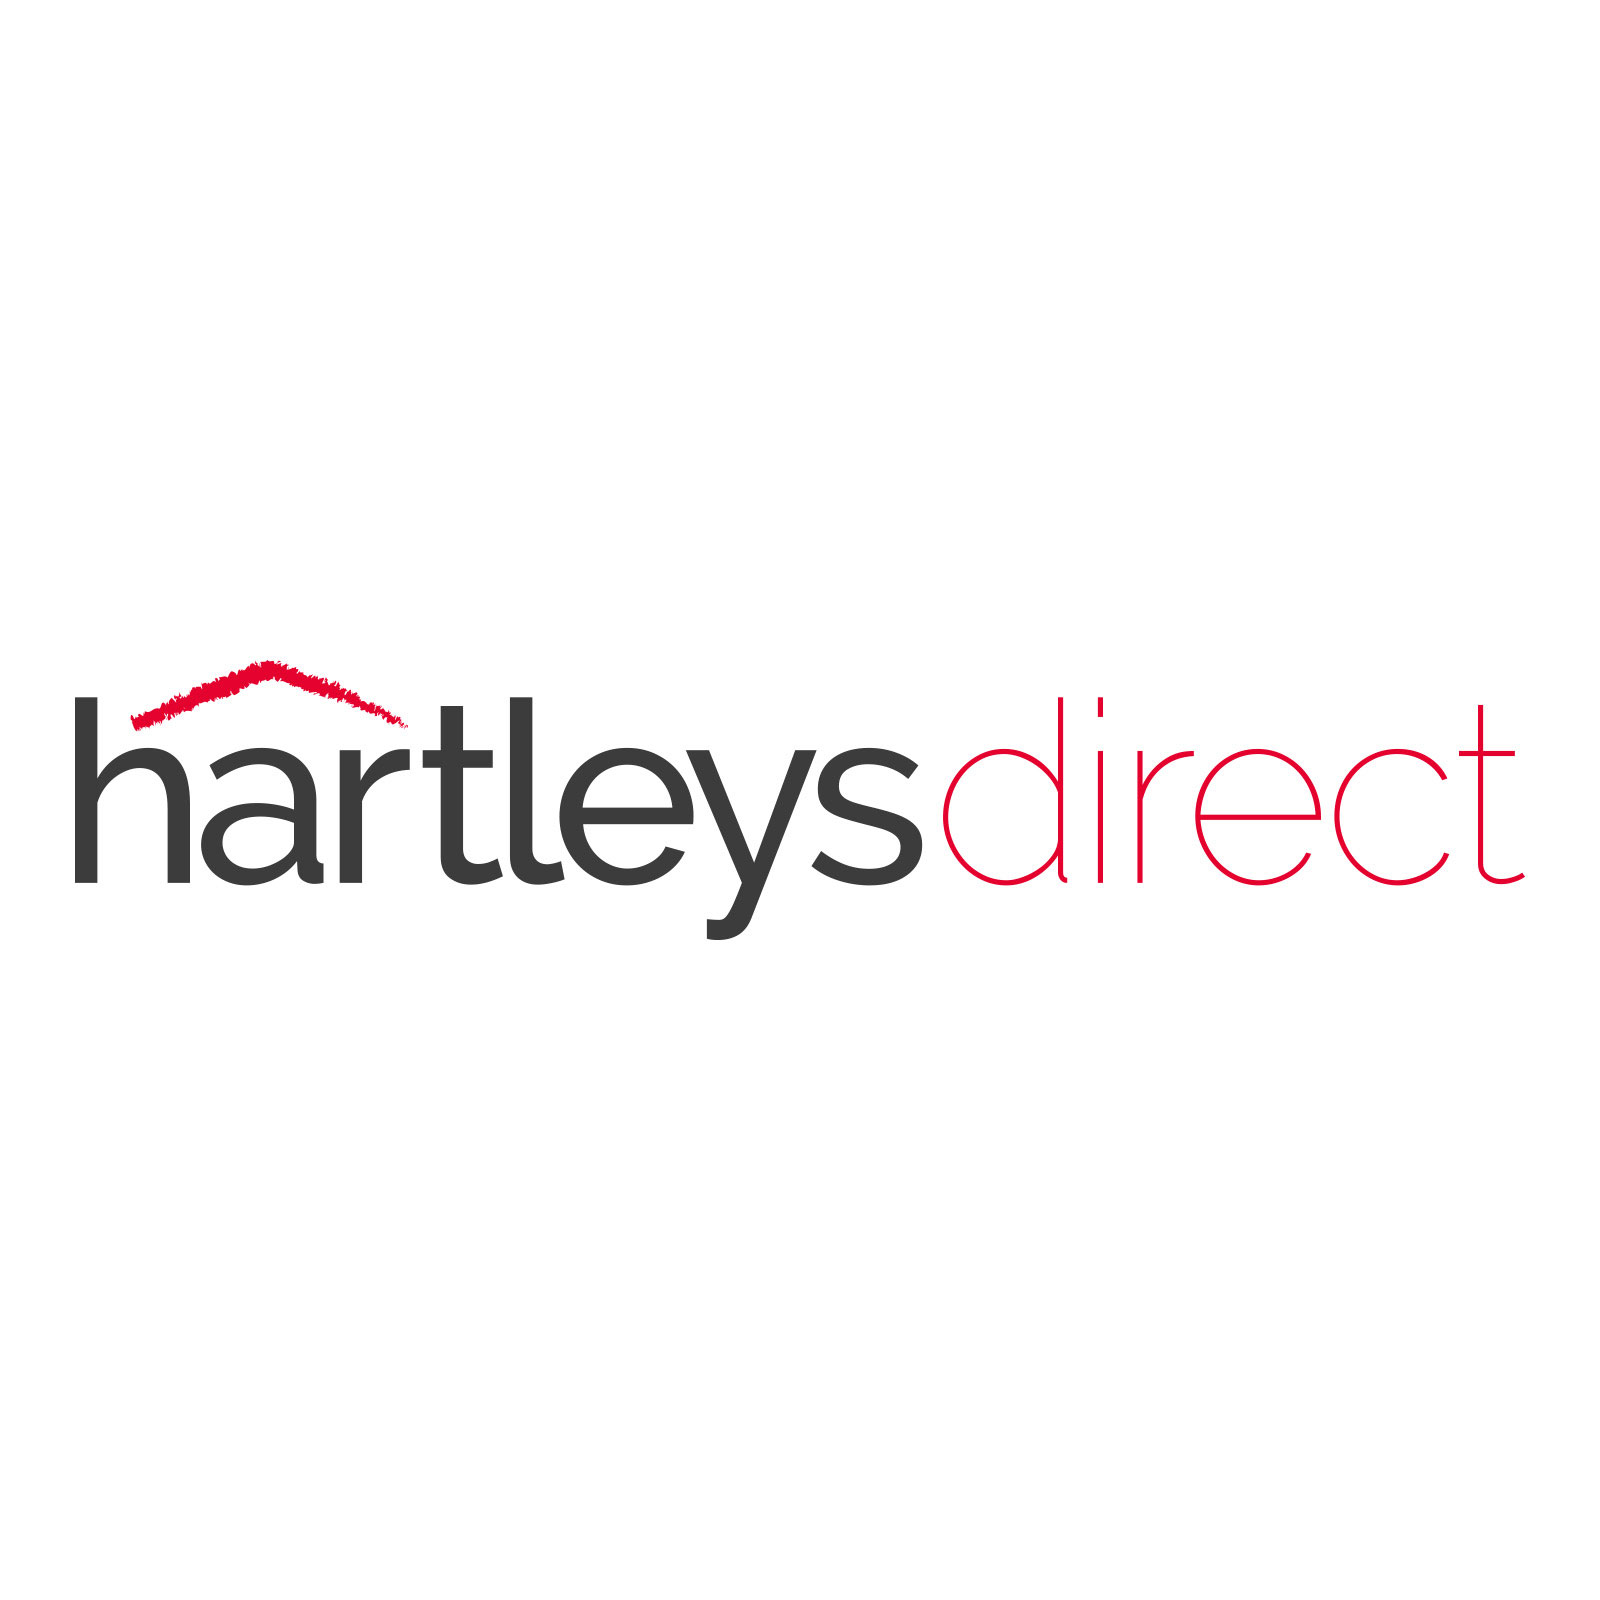 Hartleys-Set-of-Two-Floating-Shelves-on-White-Background.jpg